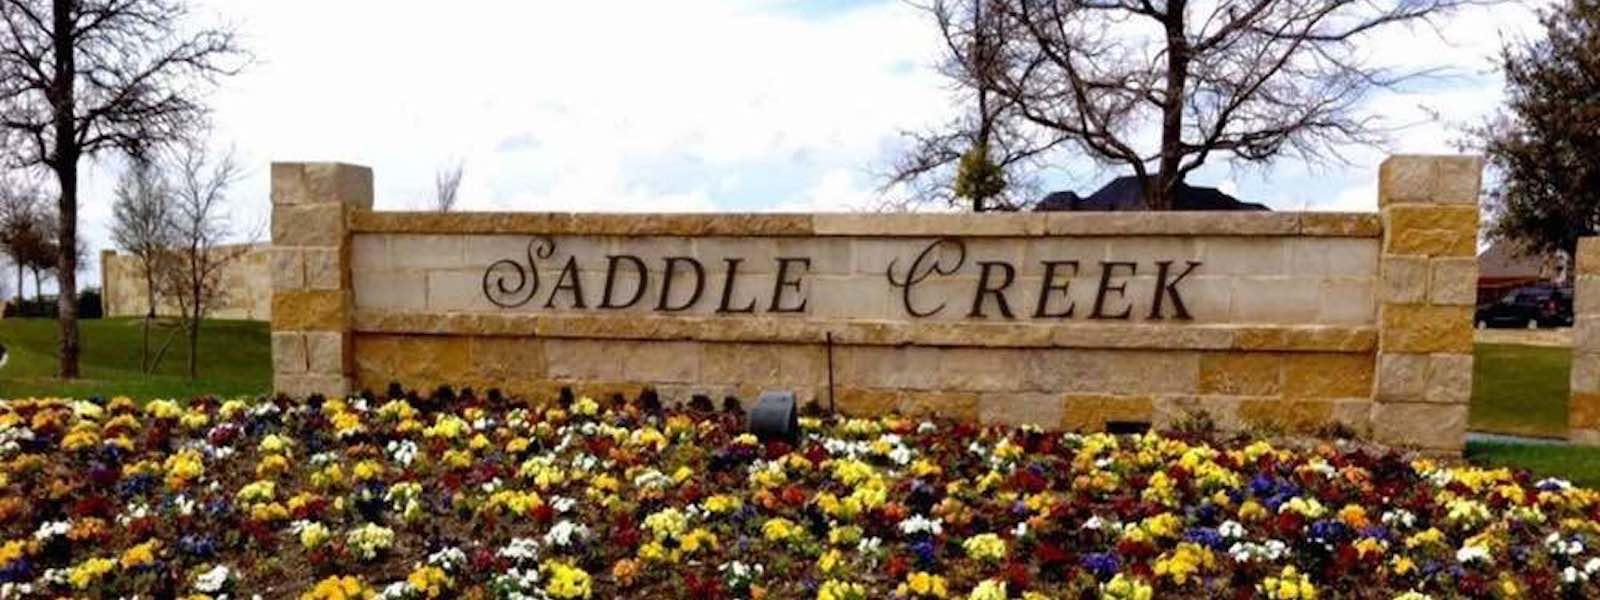 saddle creek prosper tx